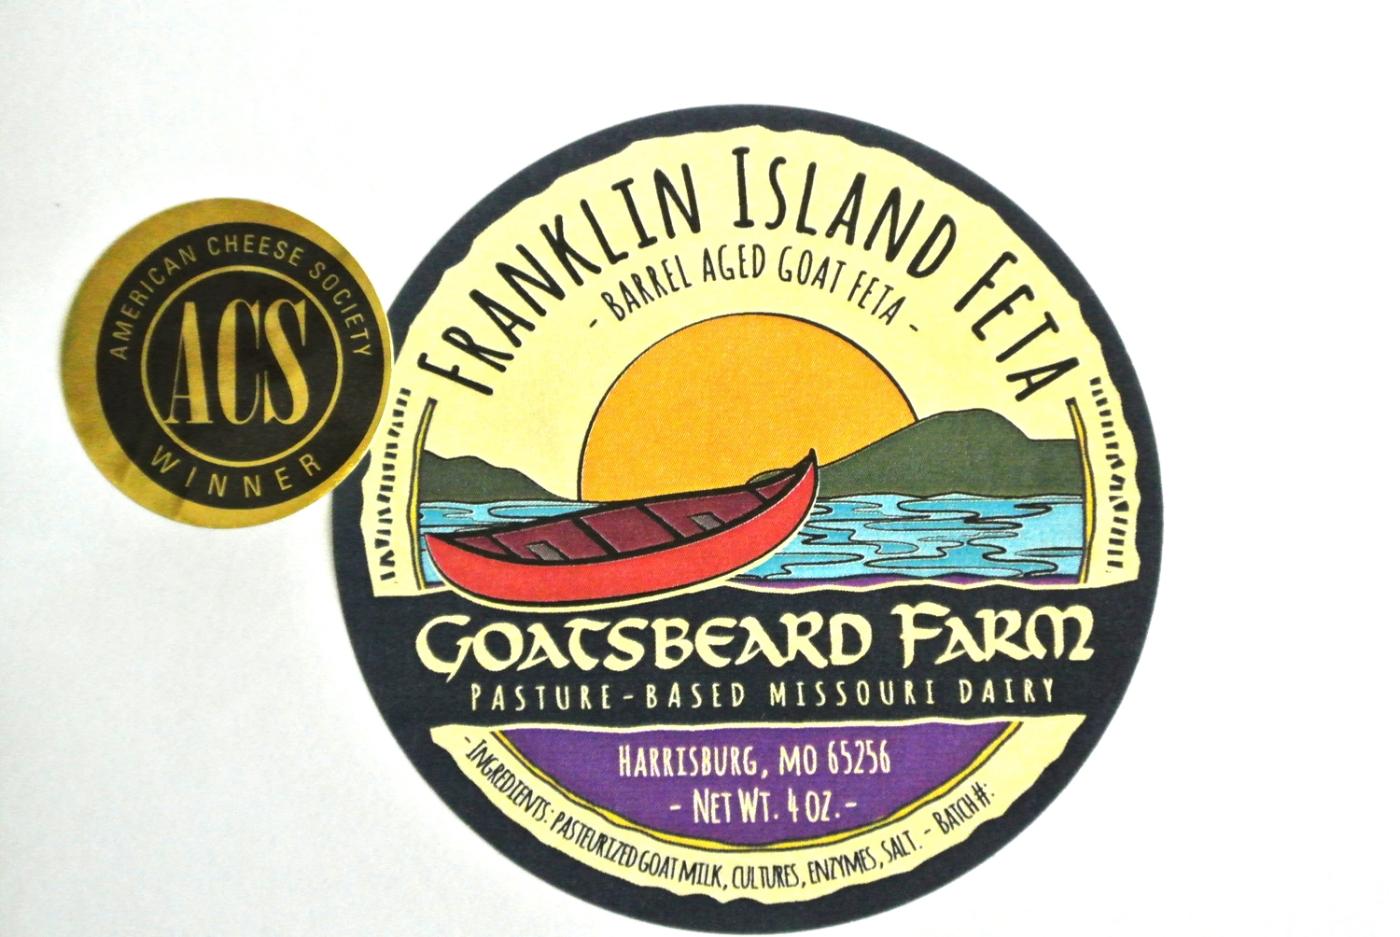 New Franklin Island Feta label.